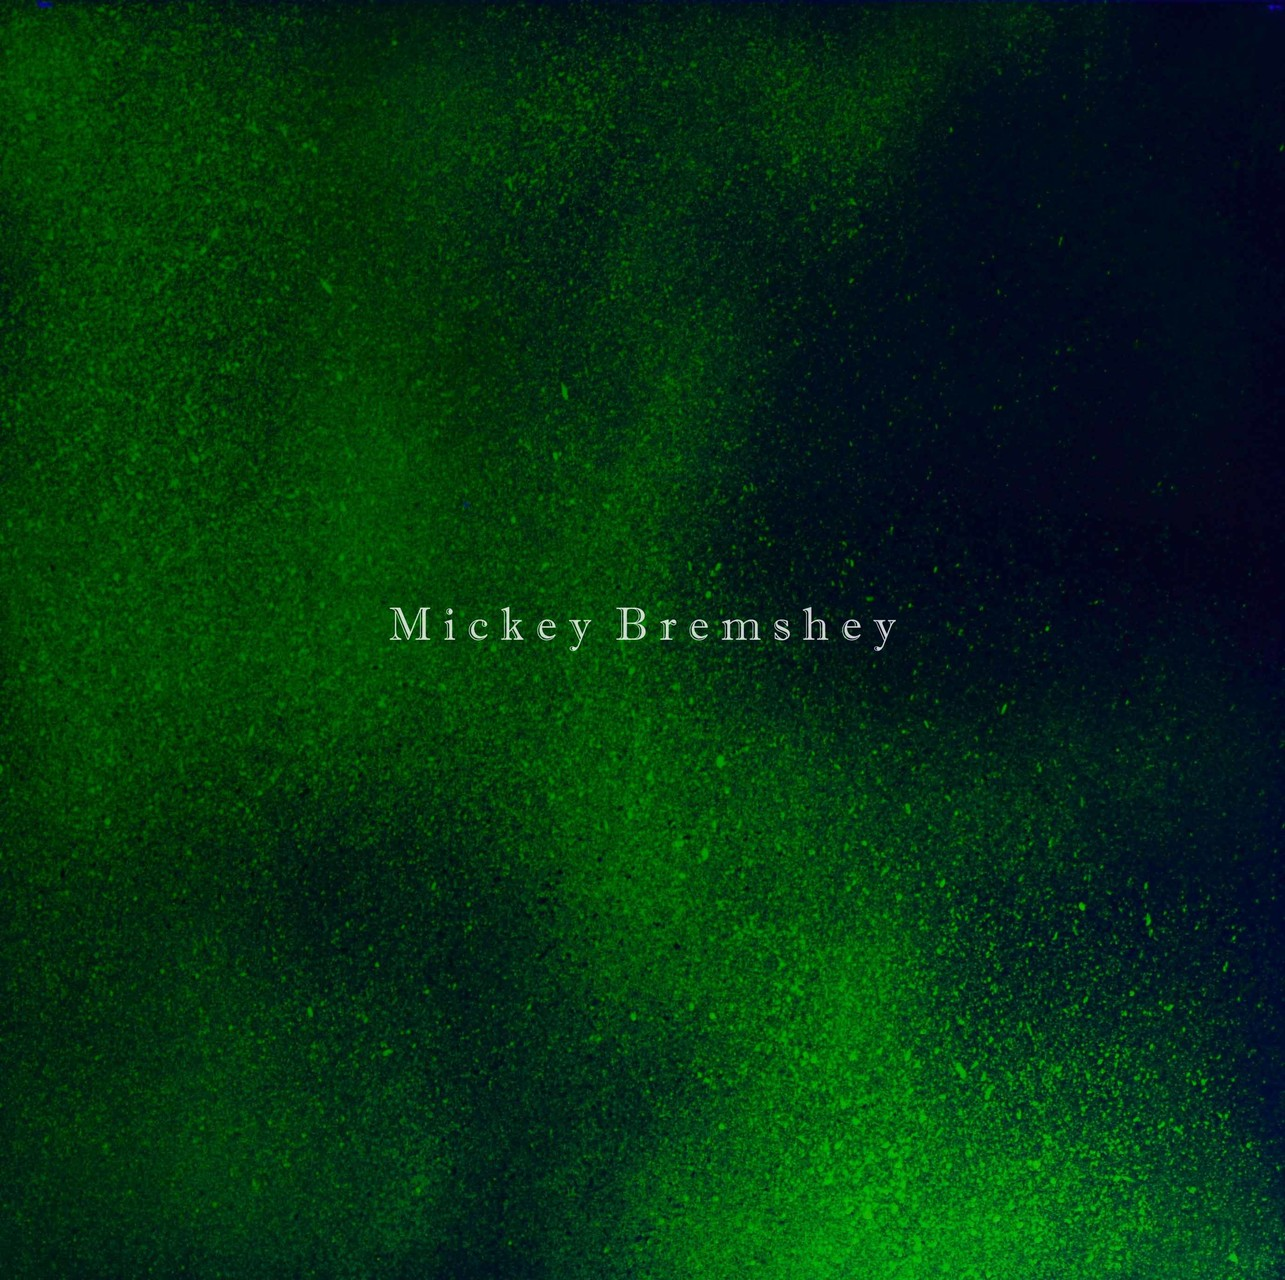 bremshey.illuminare.081275-006